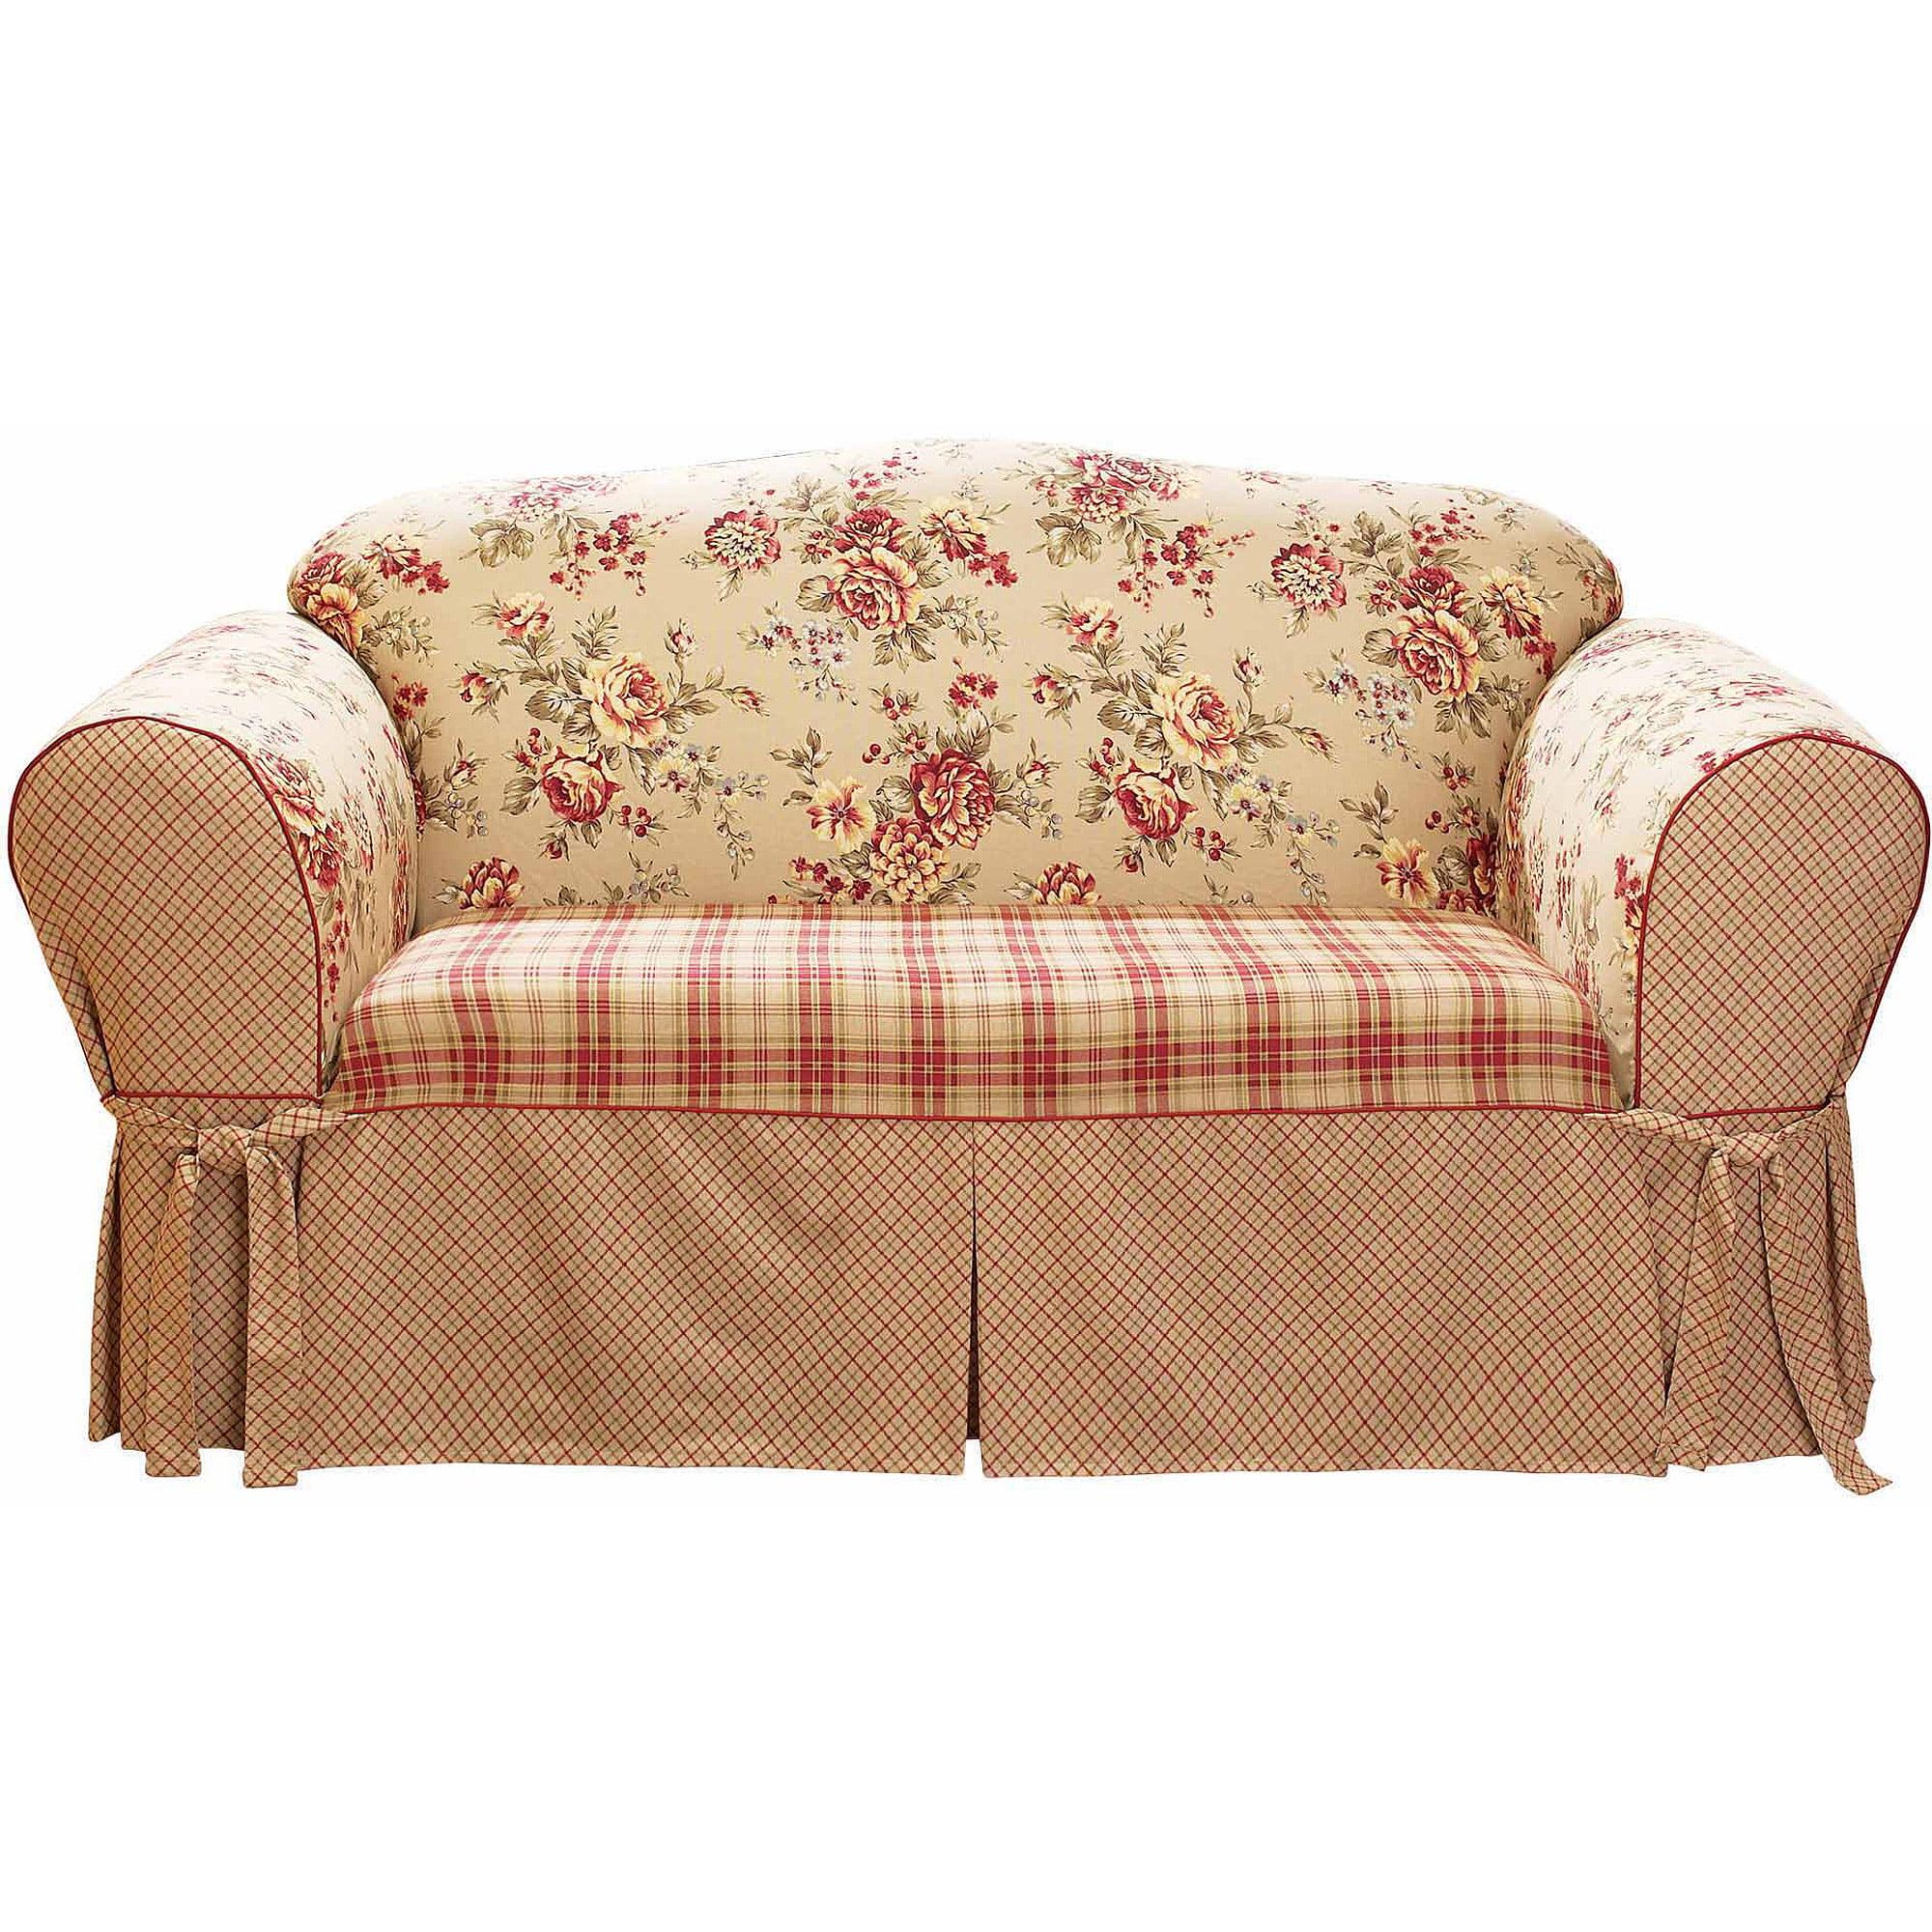 Sure Fit Lexington Sofa Slipcover, Multi-Color